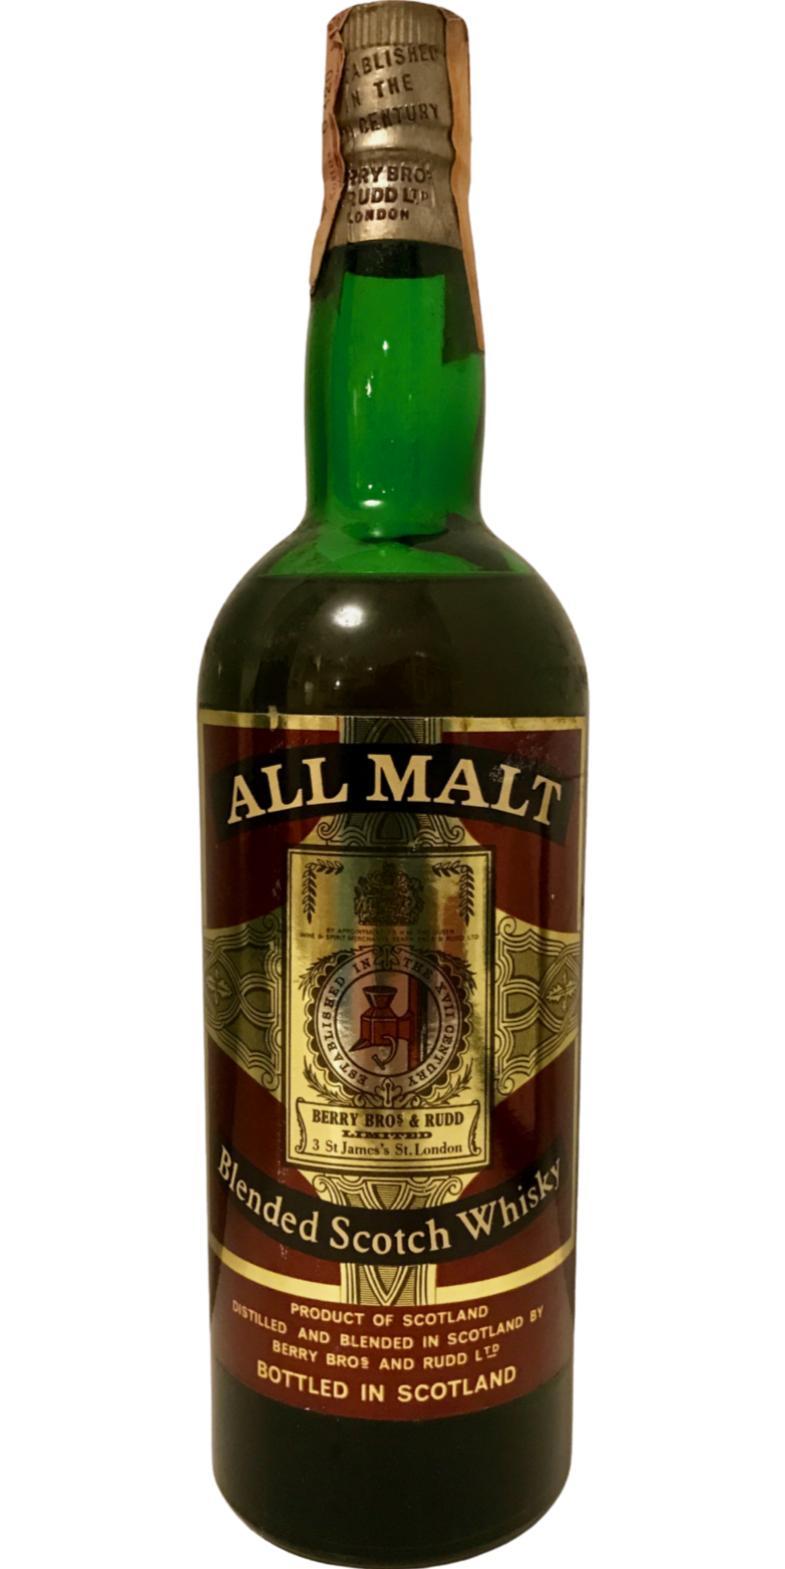 Berry's All Malt Blended Scotch Whisky